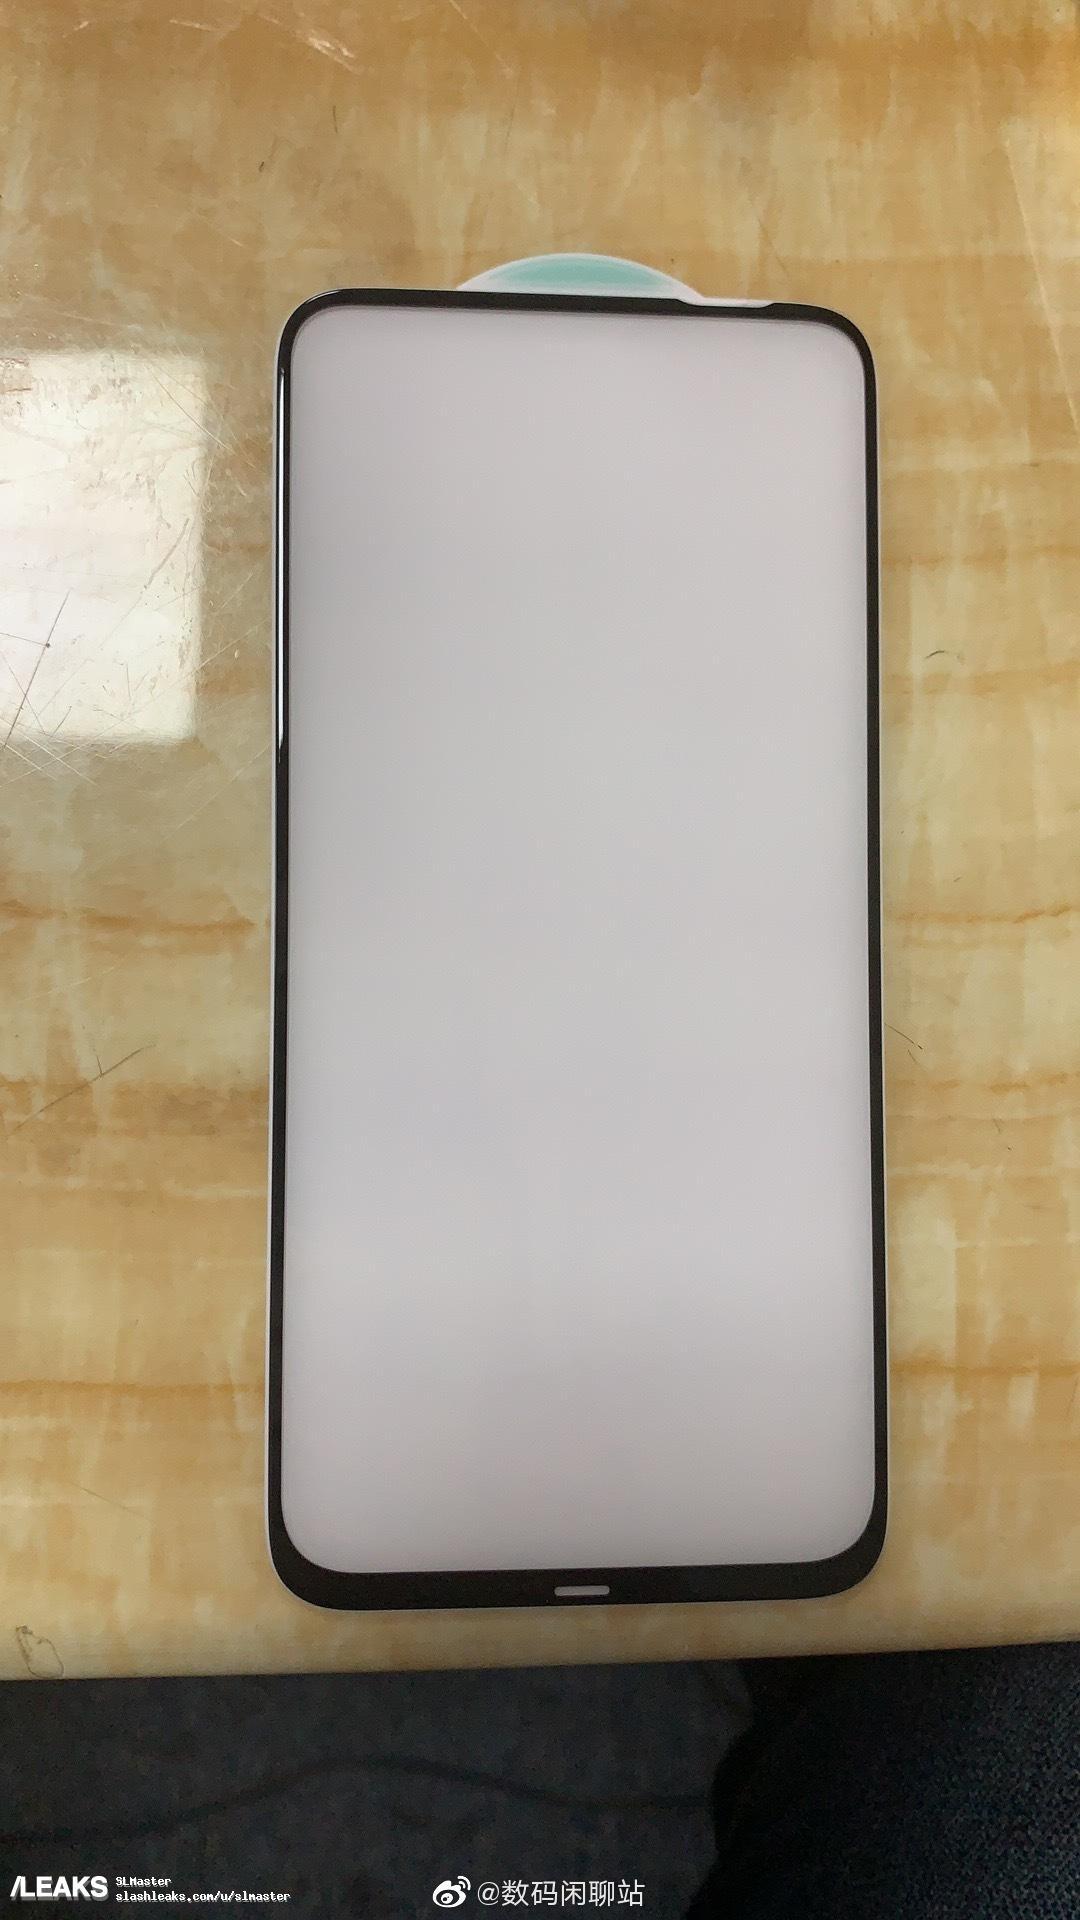 img Huawei Nova 5 and 5 Pro screen protectors surfaces